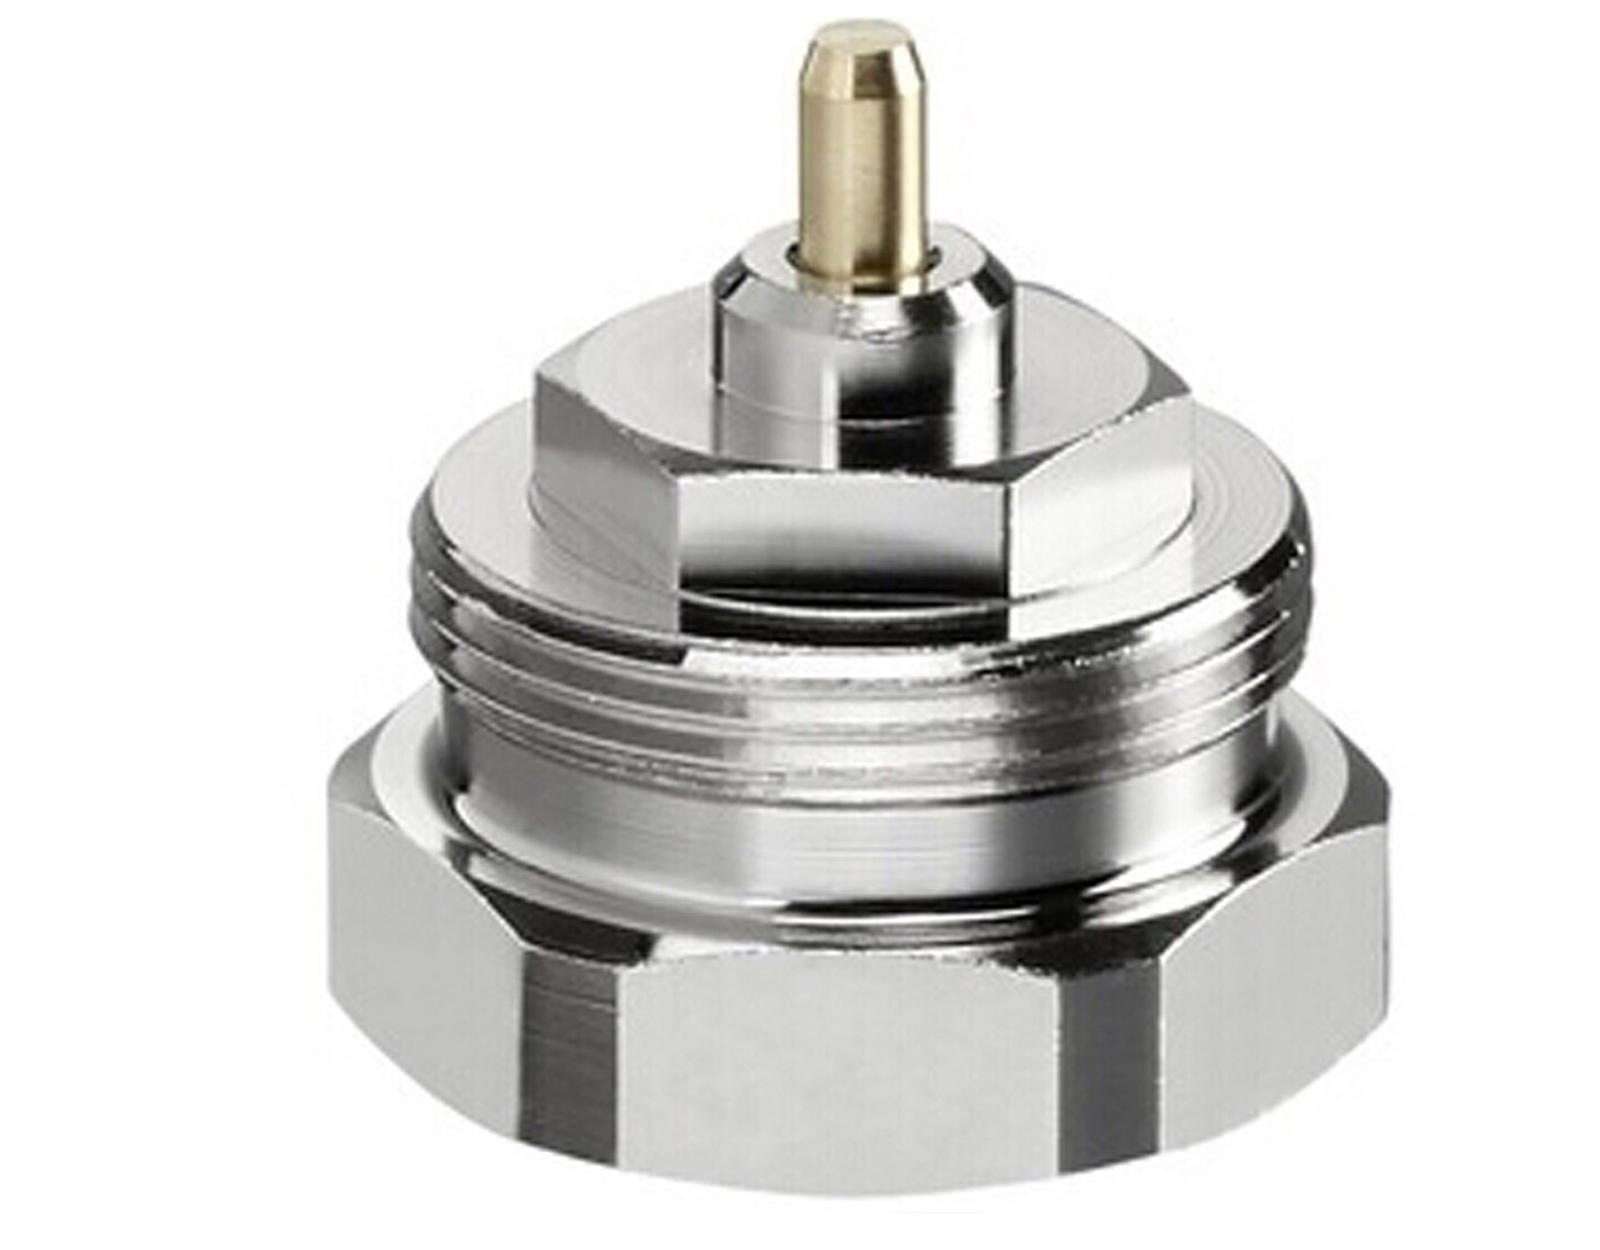 adapter heimeier thermostatkopf vaillant herz danfoss rav ravl oventrop m30x1 5 ebay. Black Bedroom Furniture Sets. Home Design Ideas